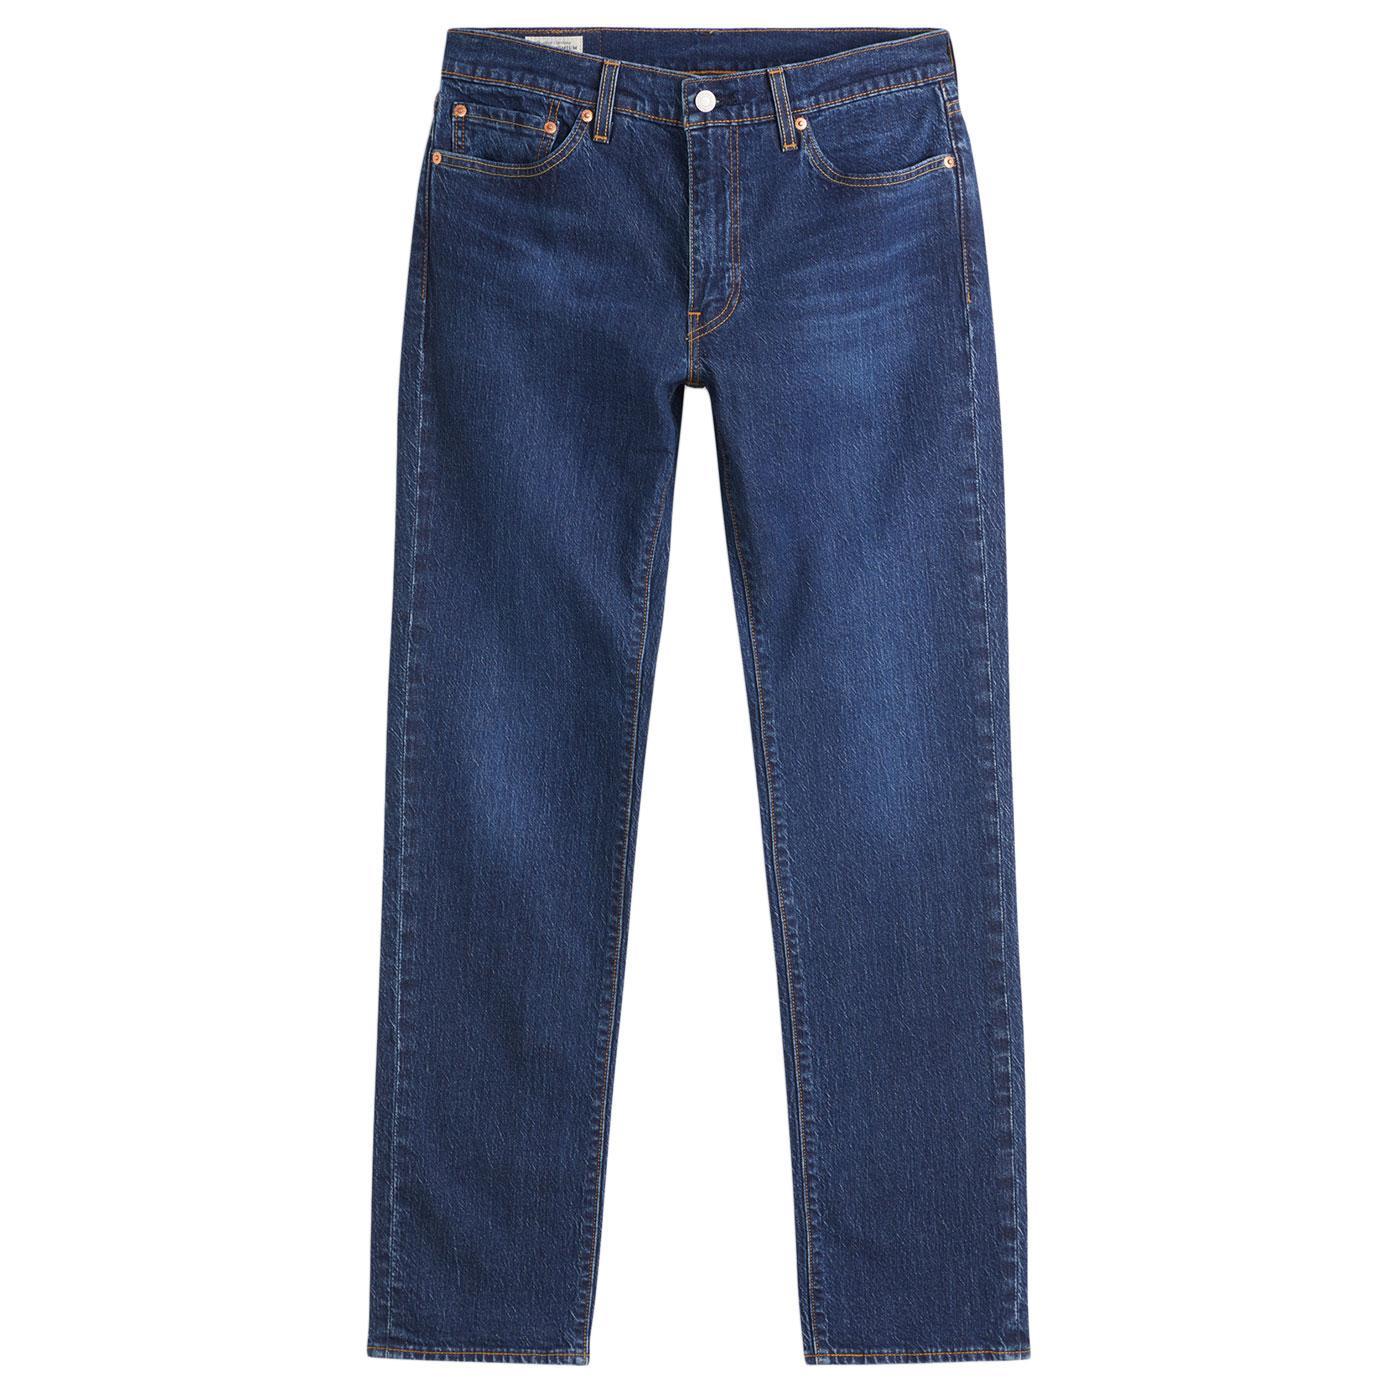 LEVI'S 511 Slim Men's Retro Denim Jeans (LJW)